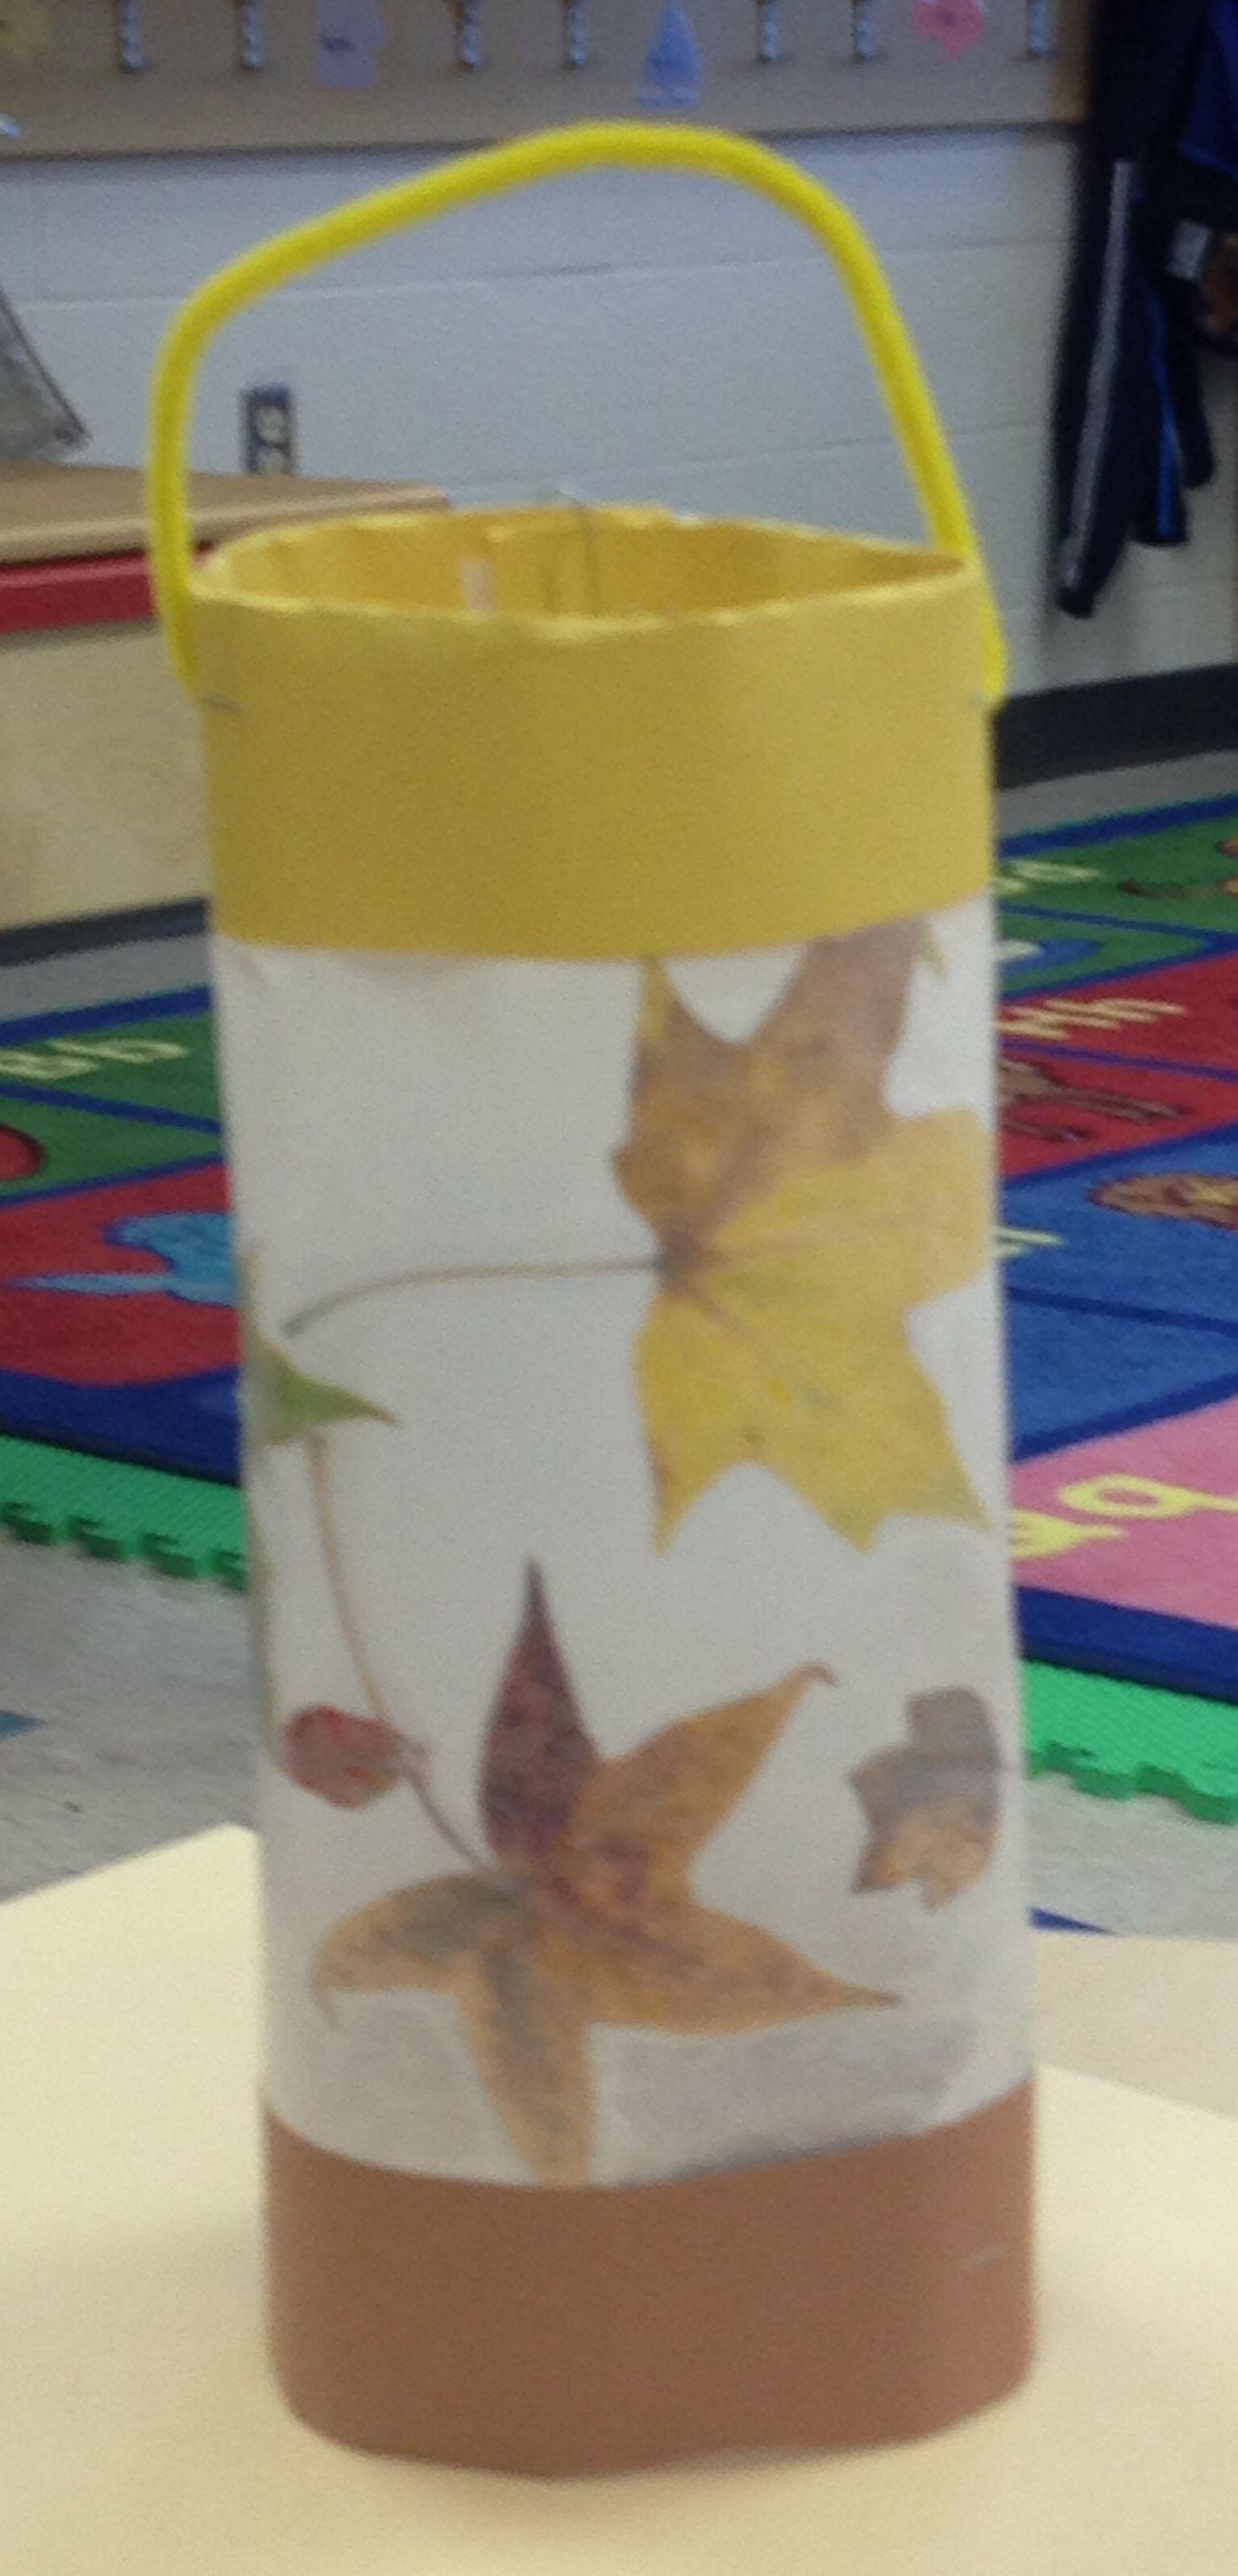 Preschool Leaf Lantern You Need Leaves Wax Paper Iron